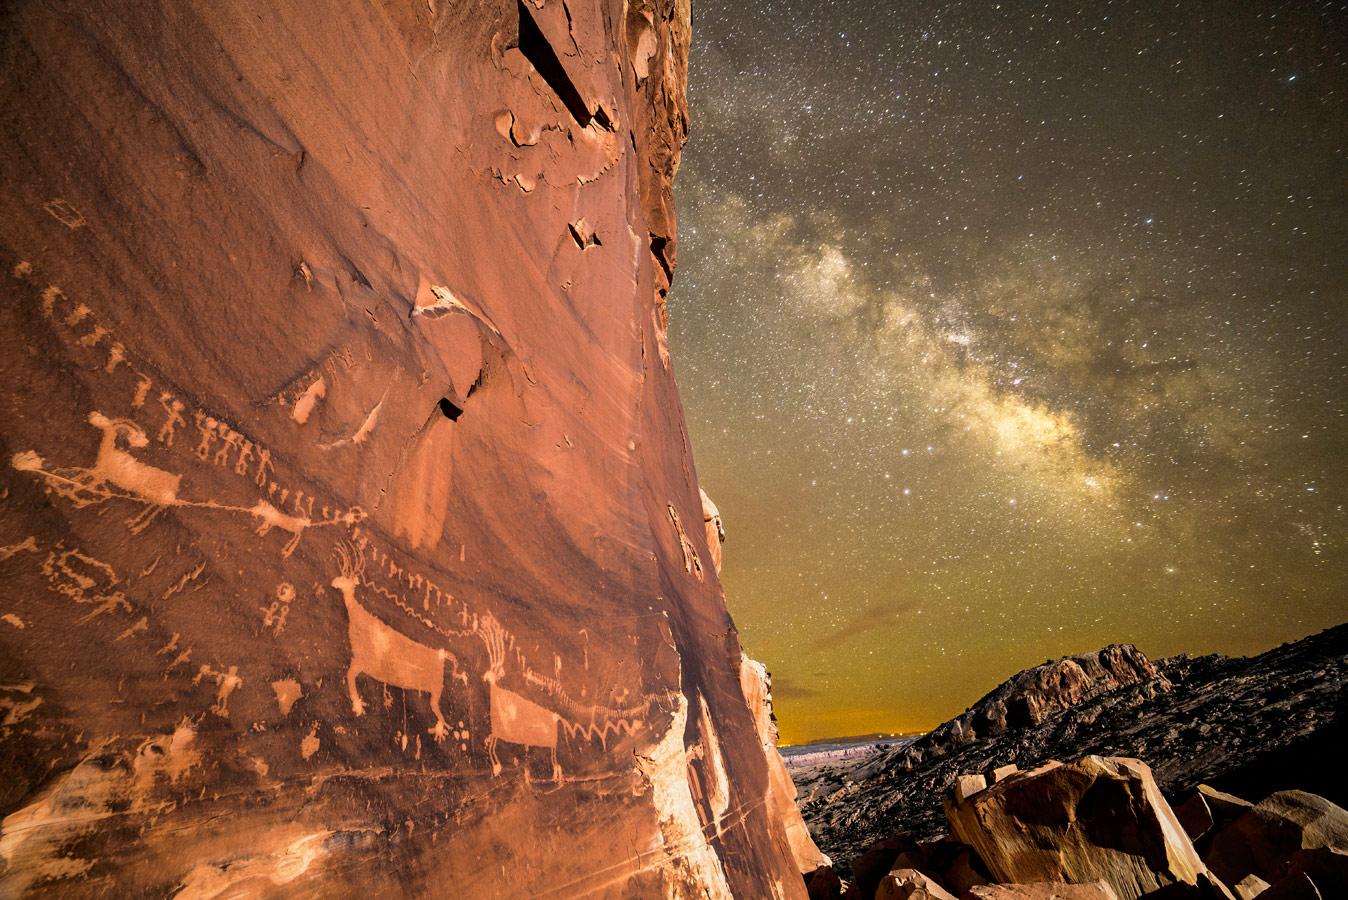 © Марк Тосо / Ancient Skys, 9-е место, Фотоконкурс «Вики любит памятники» — Wiki Loves Monuments